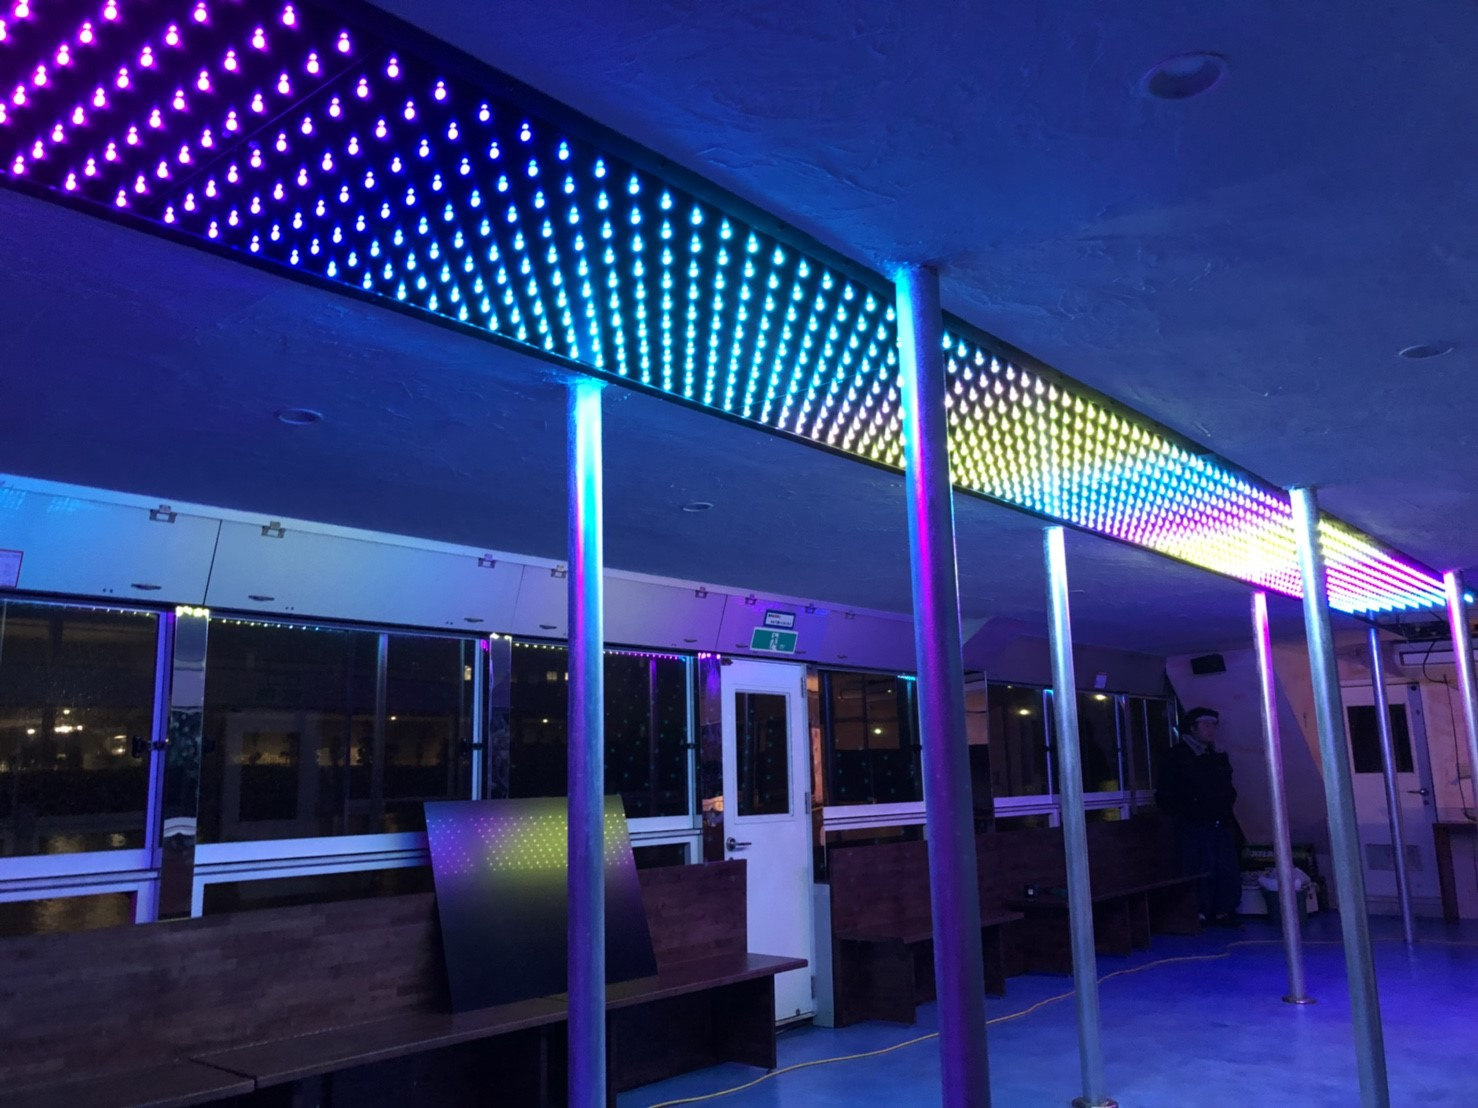 LEDで光の装飾がされた船内